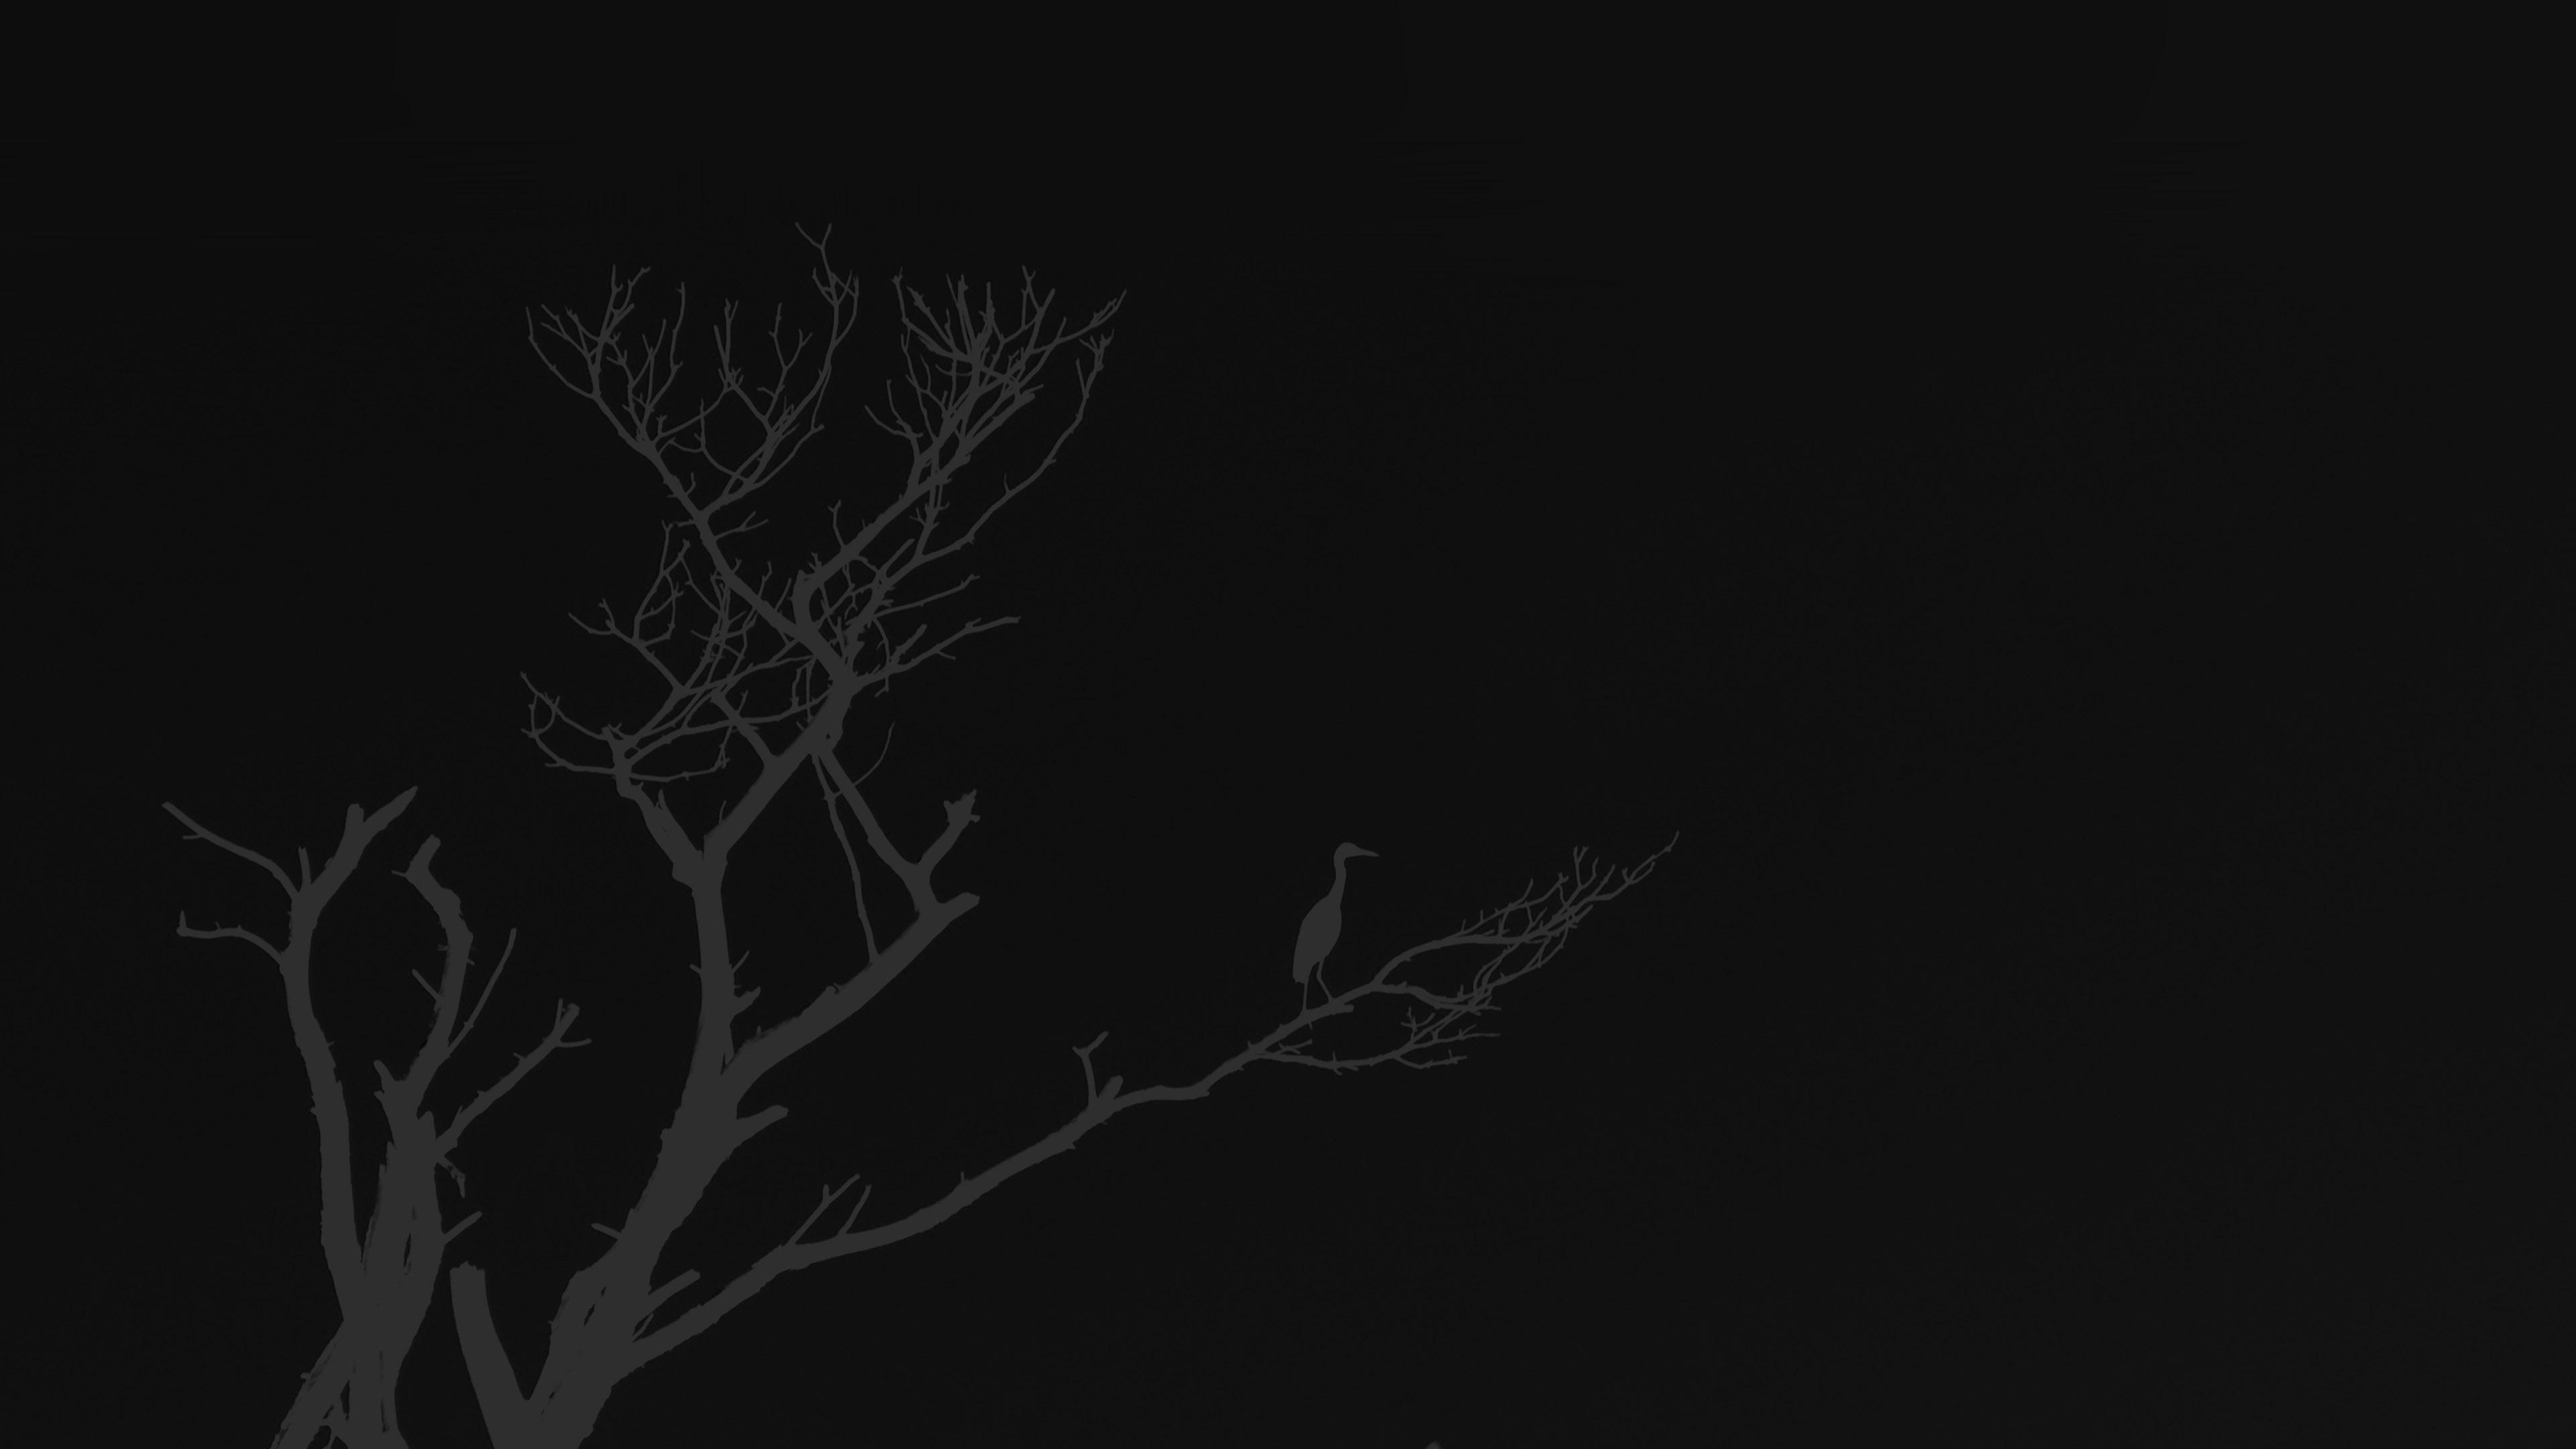 wallpaper for desktop, laptop   mk98-bird-sunset-tree-dark ...